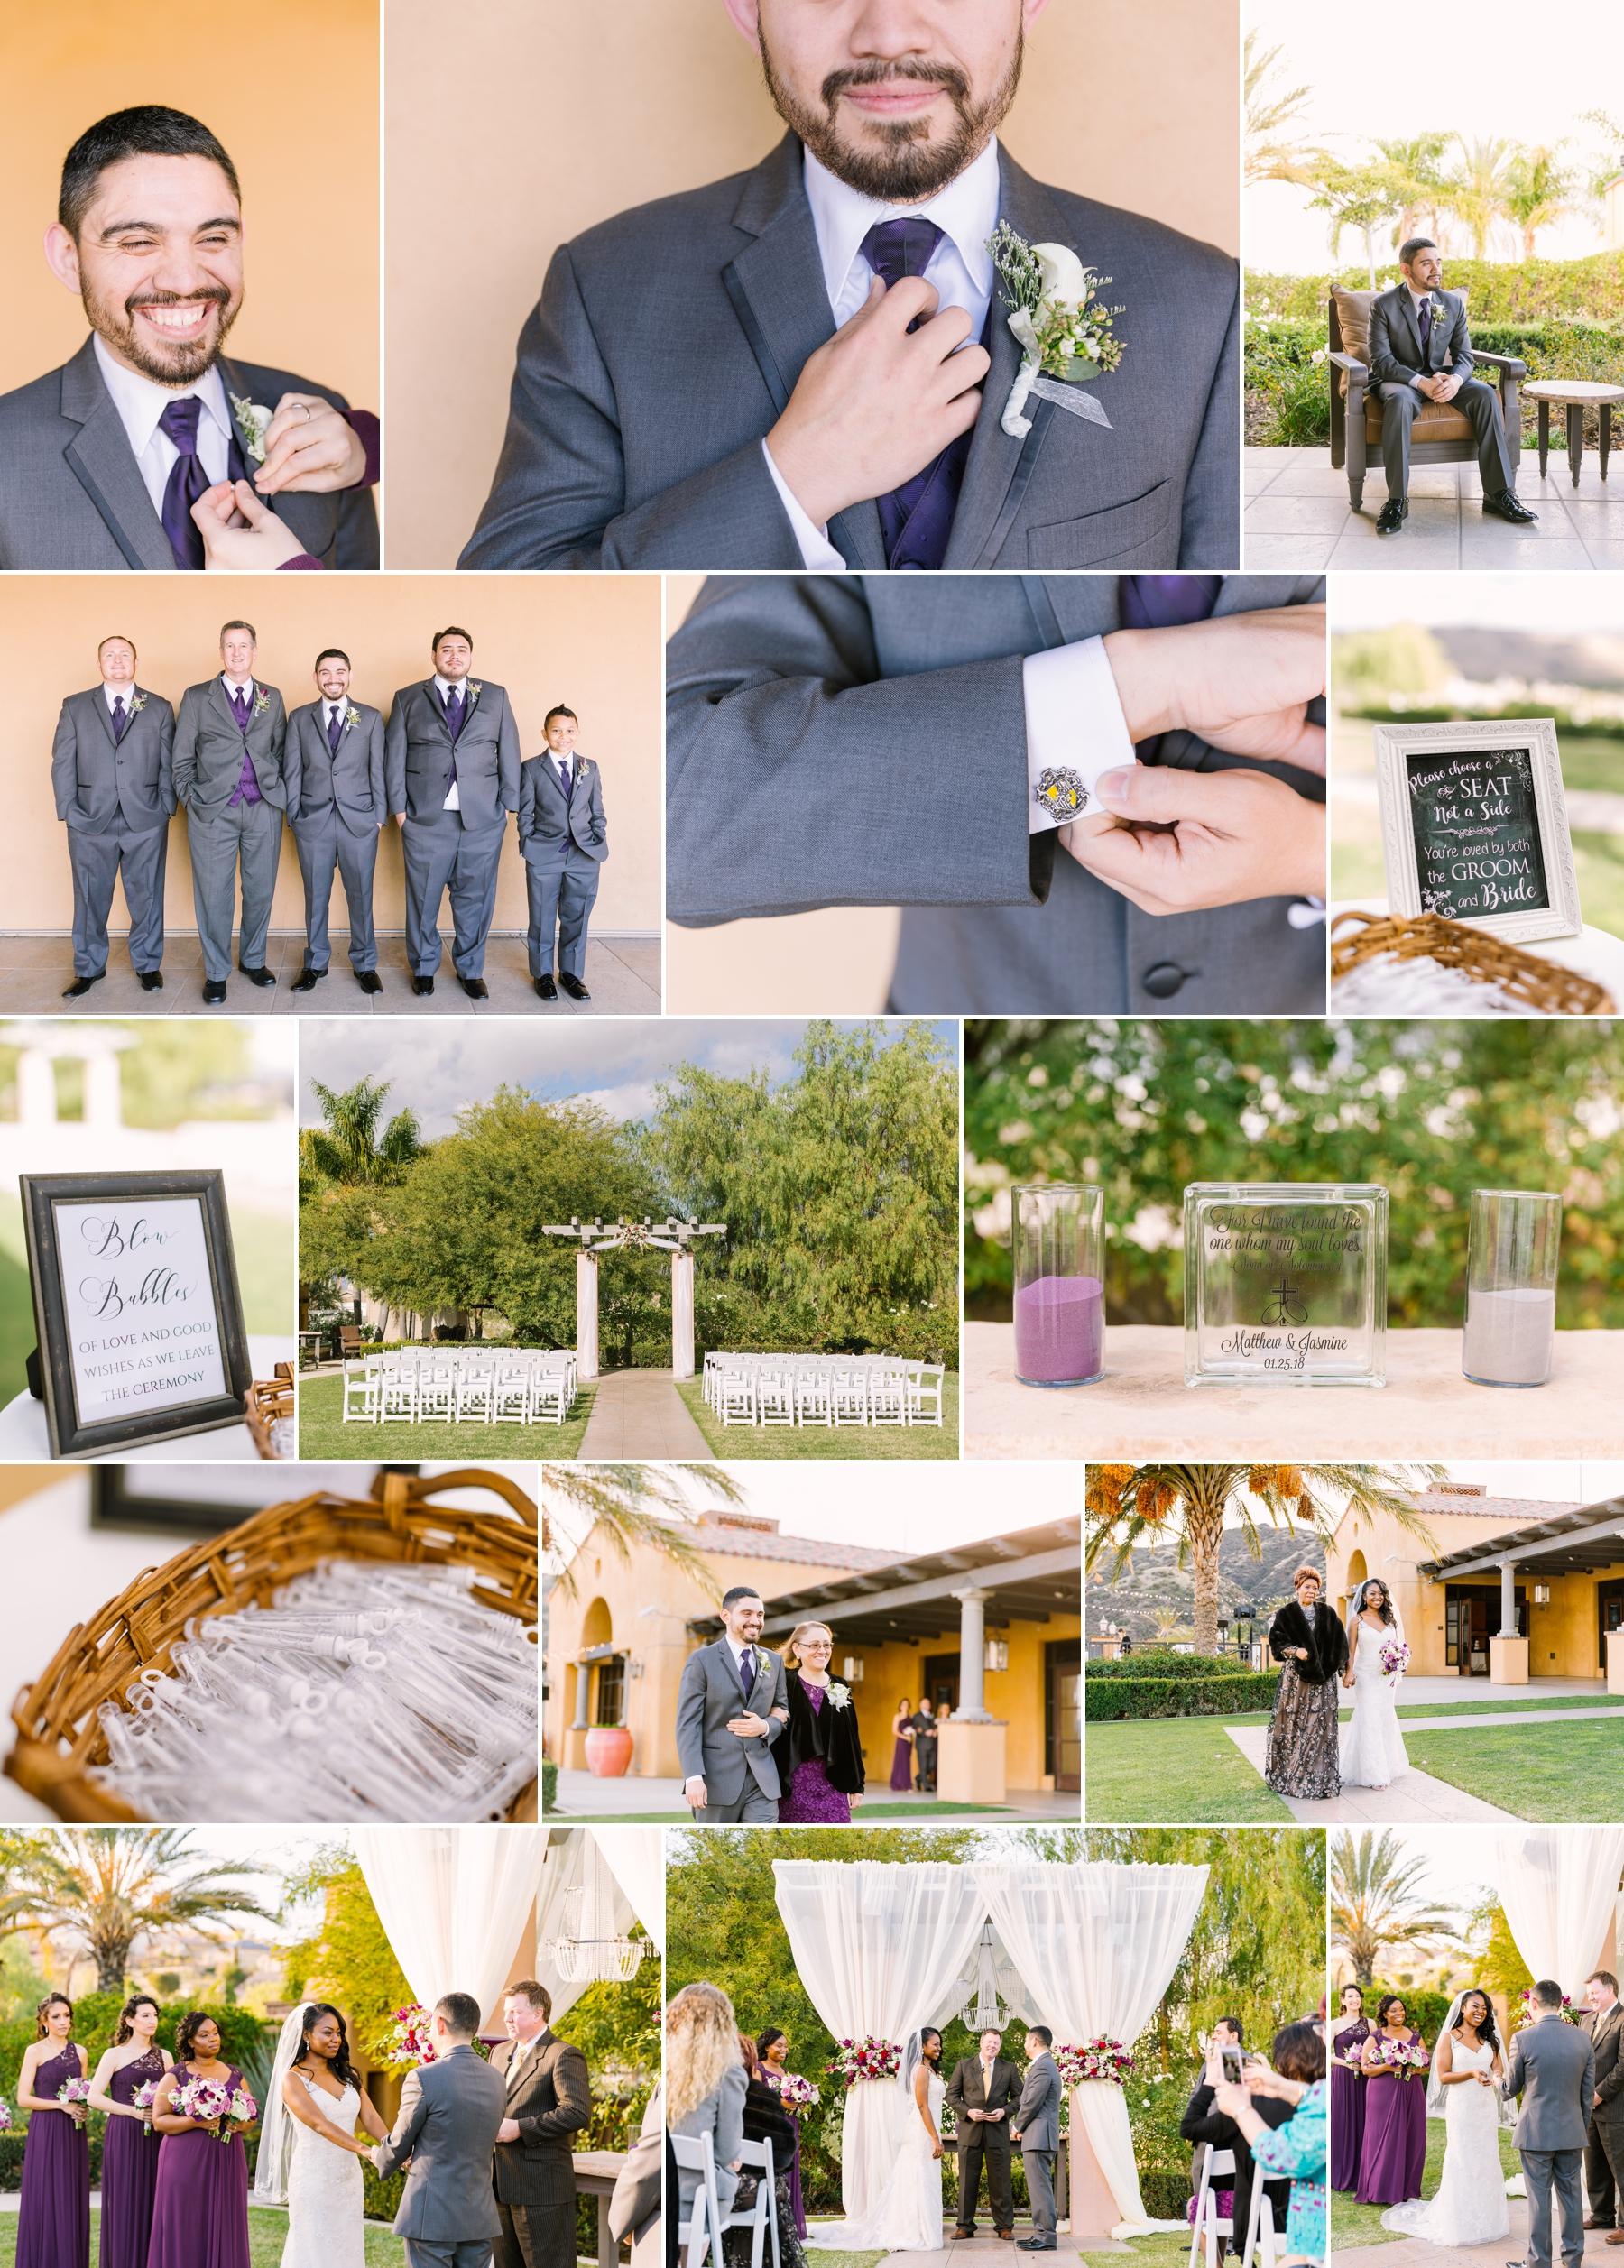 affordable-wedding-photography-orange-county-wedgewood-at-the-retreat-wedding-shy-heart-studios-2